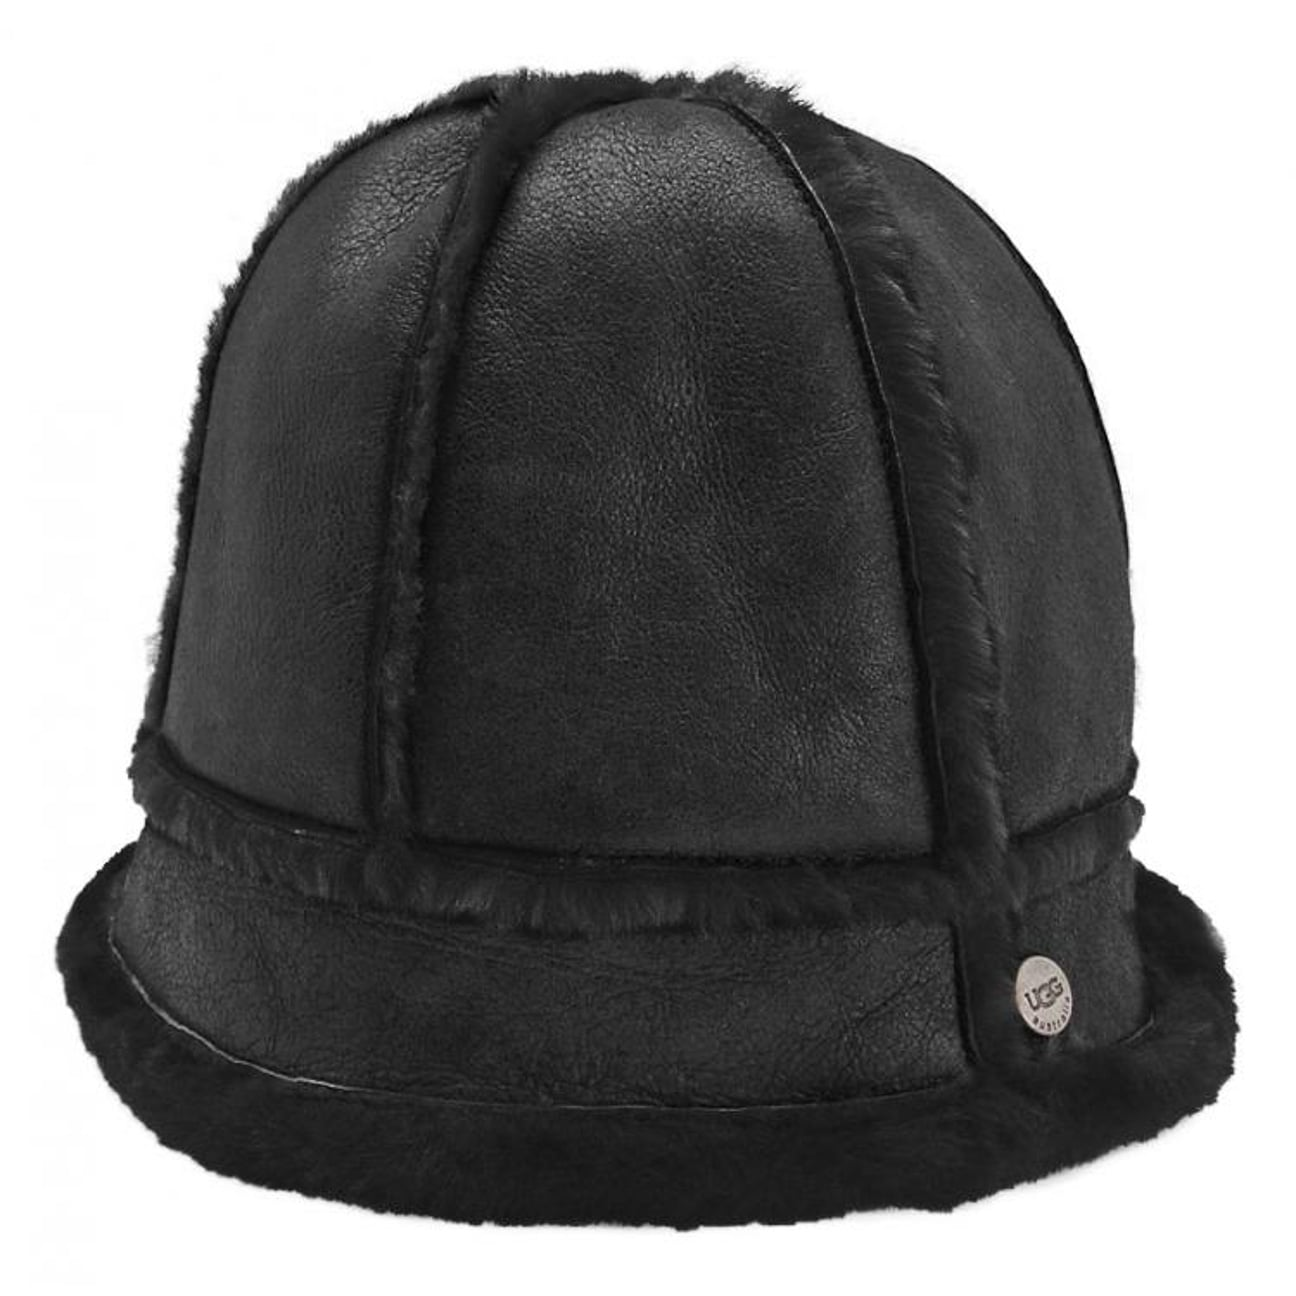 ... Cappello da Donna in Pelle by UGG - cammello 1 21d5a7755806